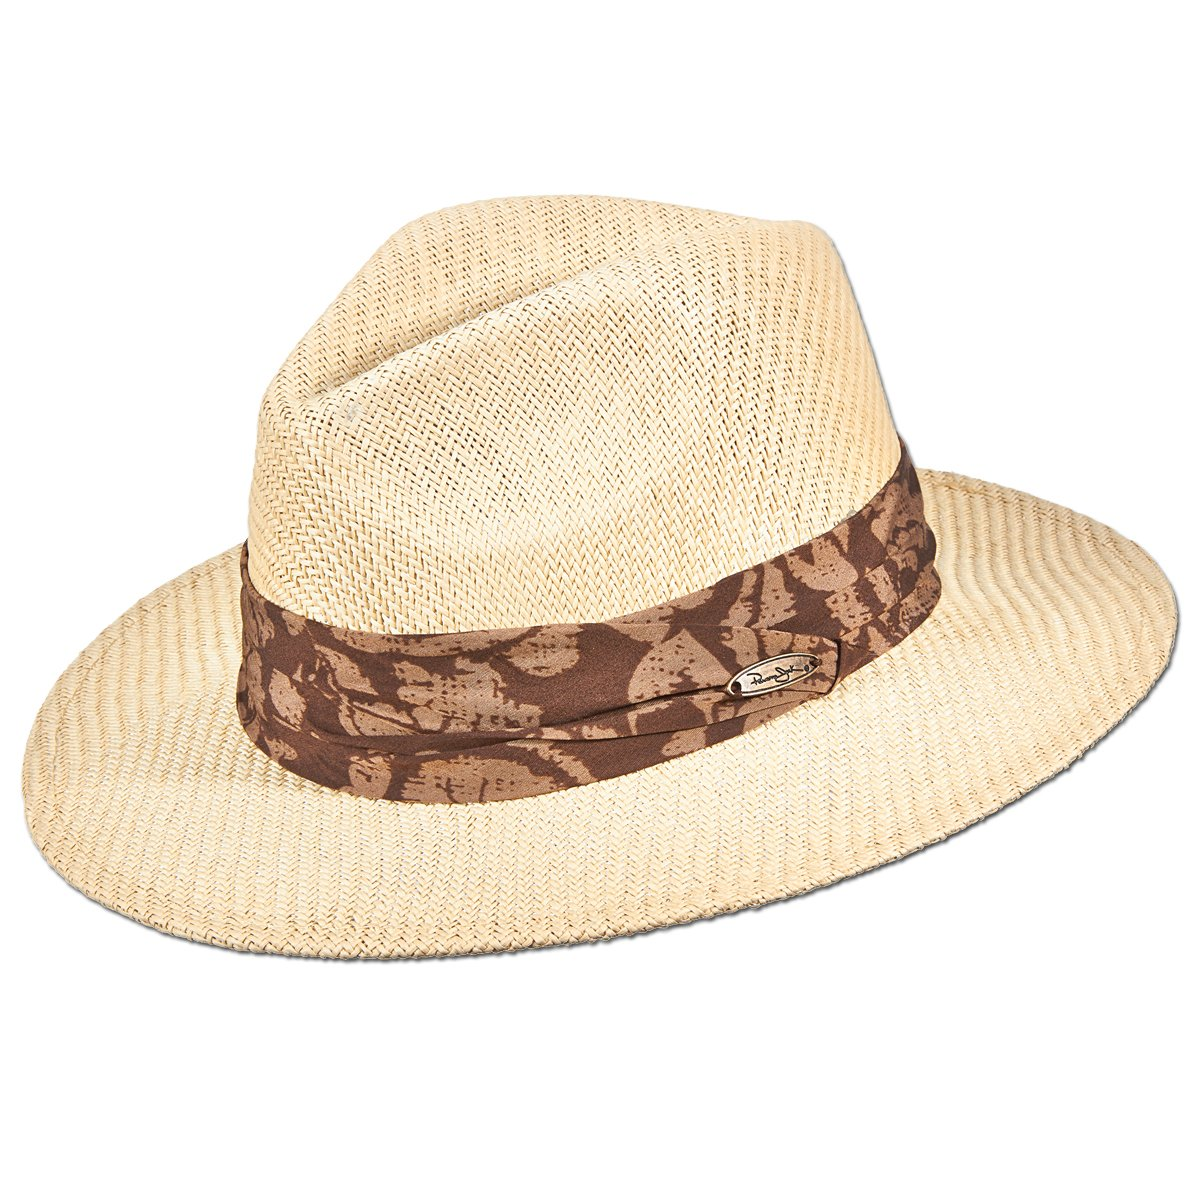 ae3527477 Panama Jack Matte Toyo Straw Safari Sun Hat with 3-Pleat Ribbon Band ...